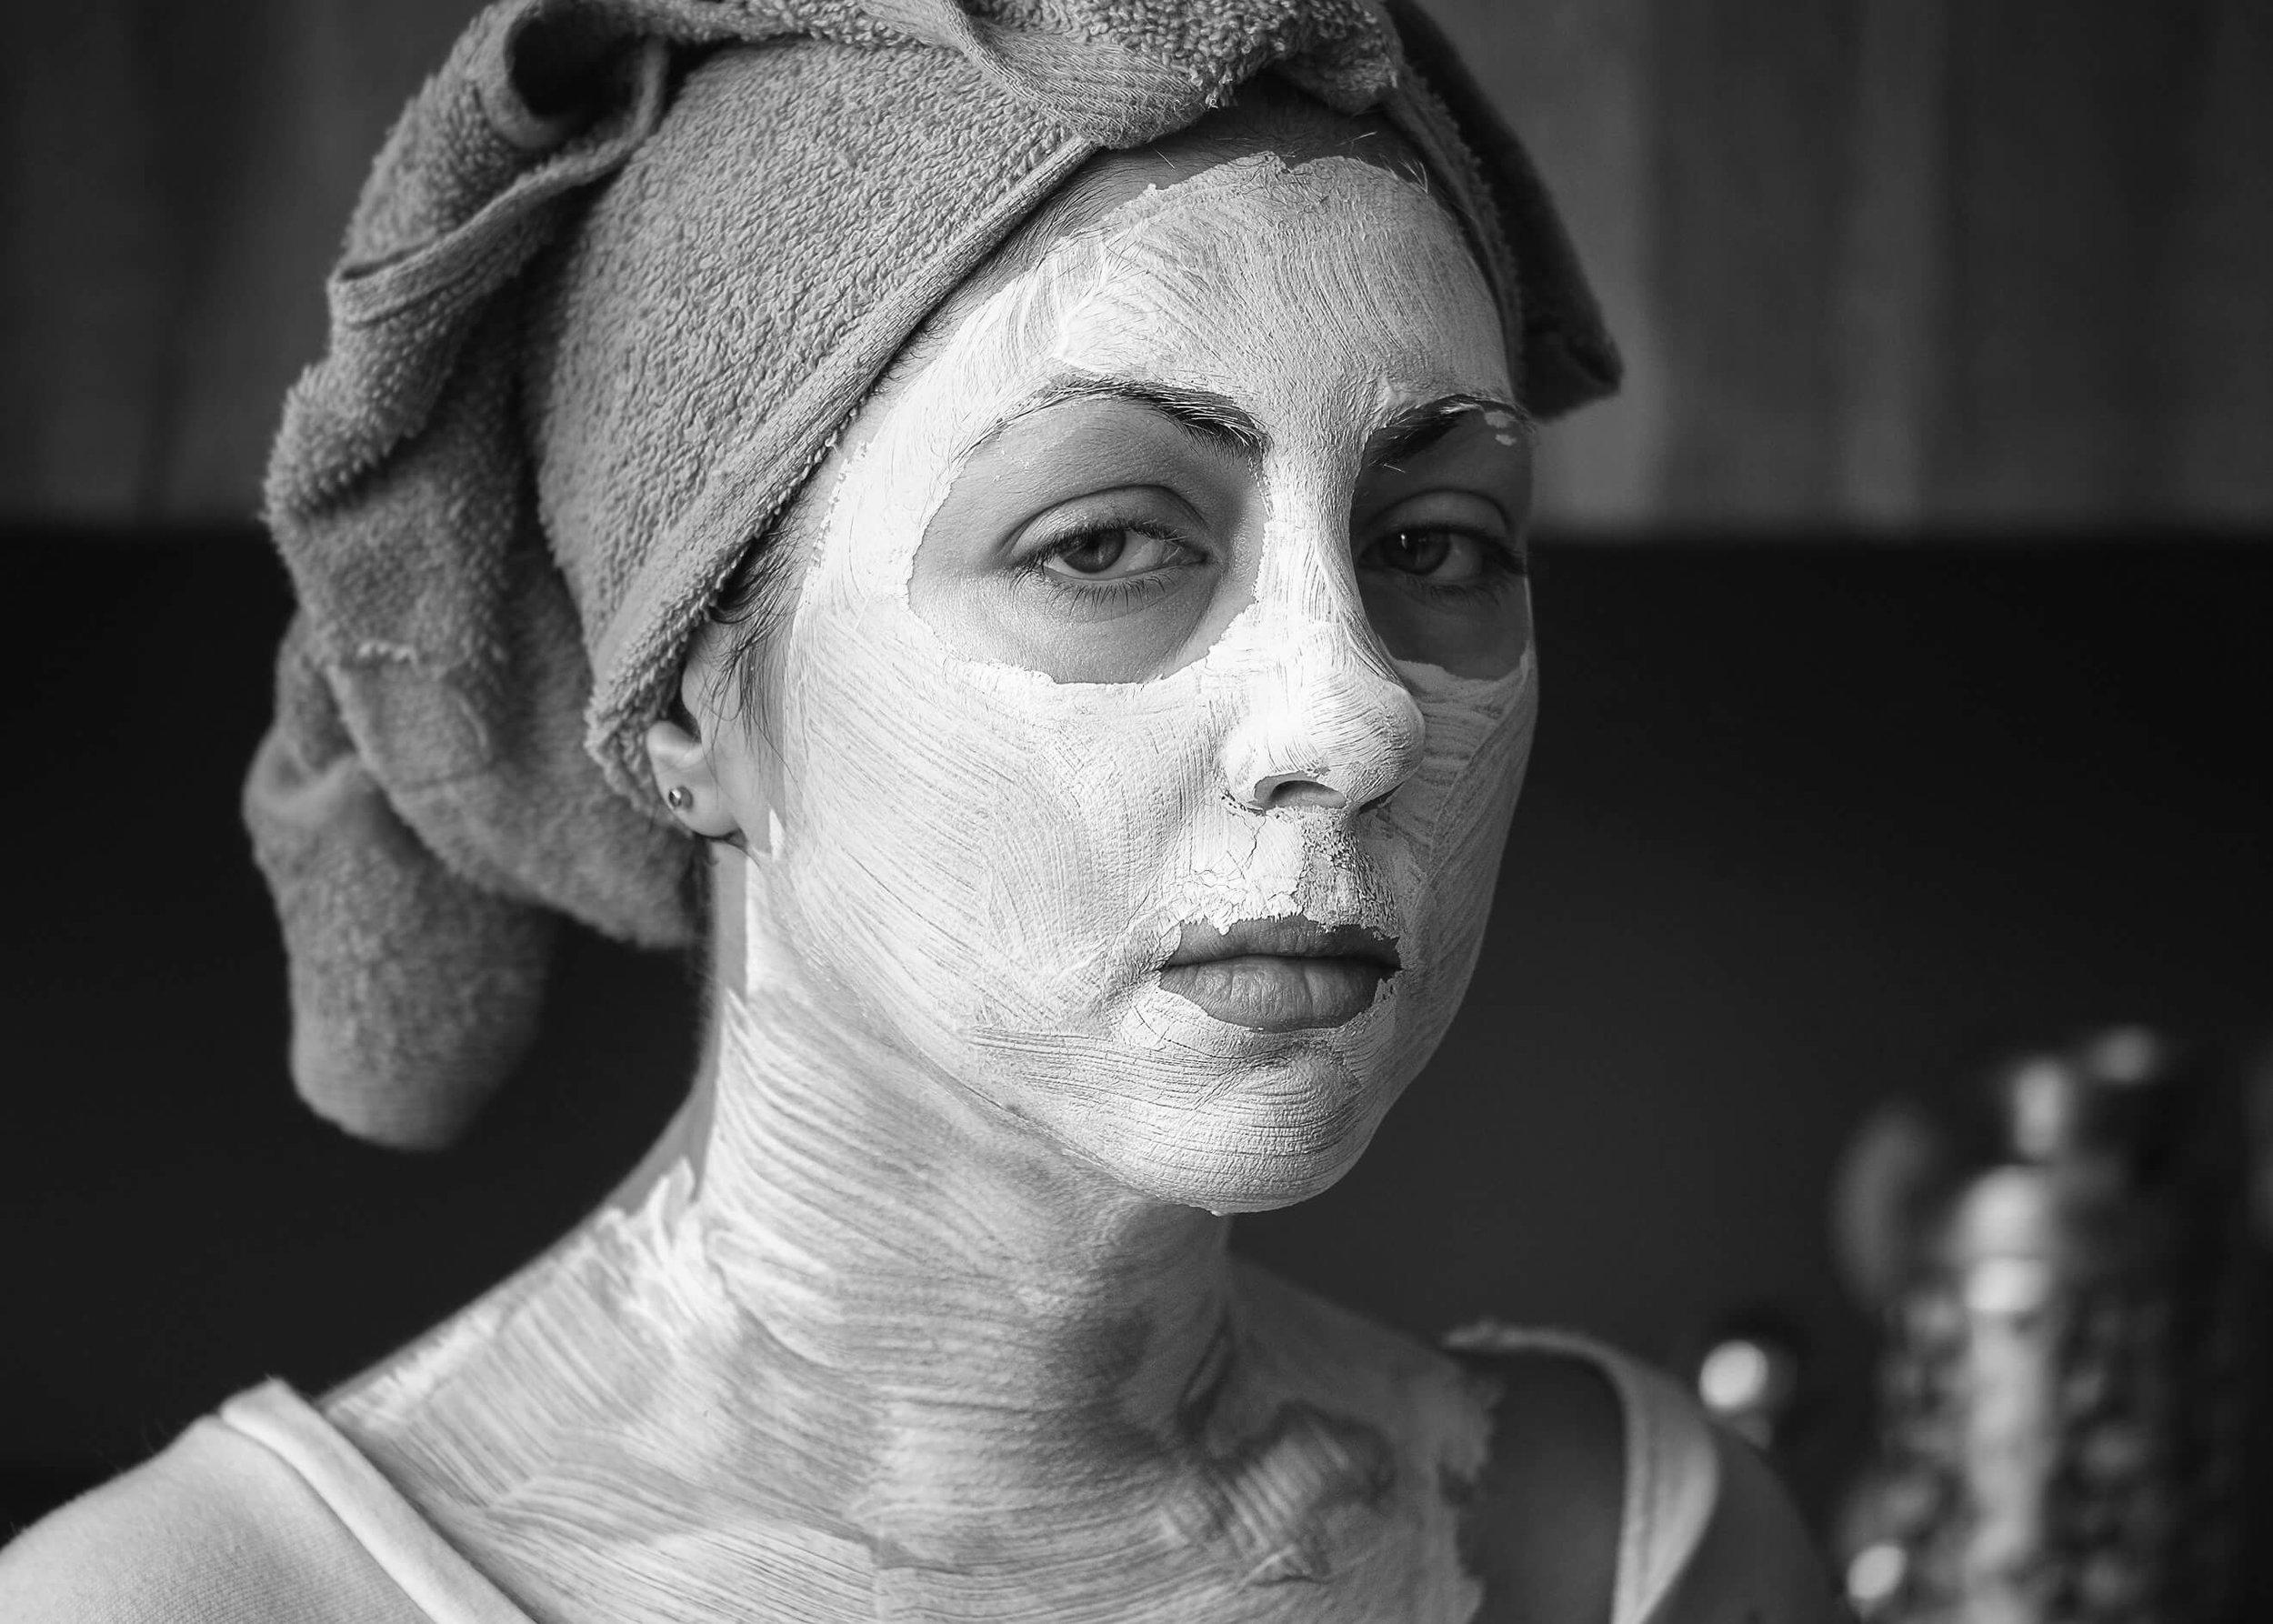 masks and peels sage skin care